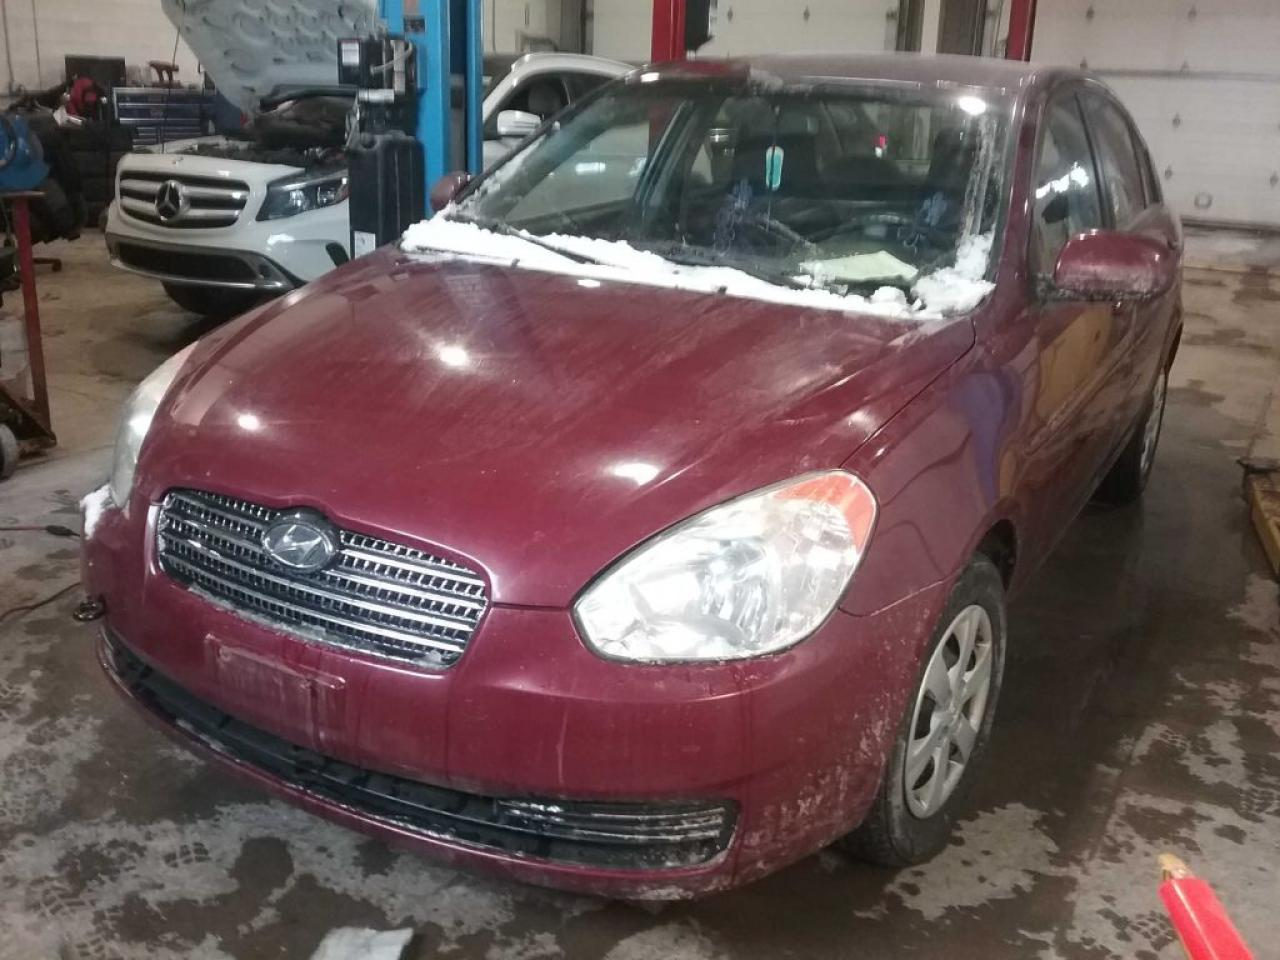 Photo of Red 2010 Hyundai Accent